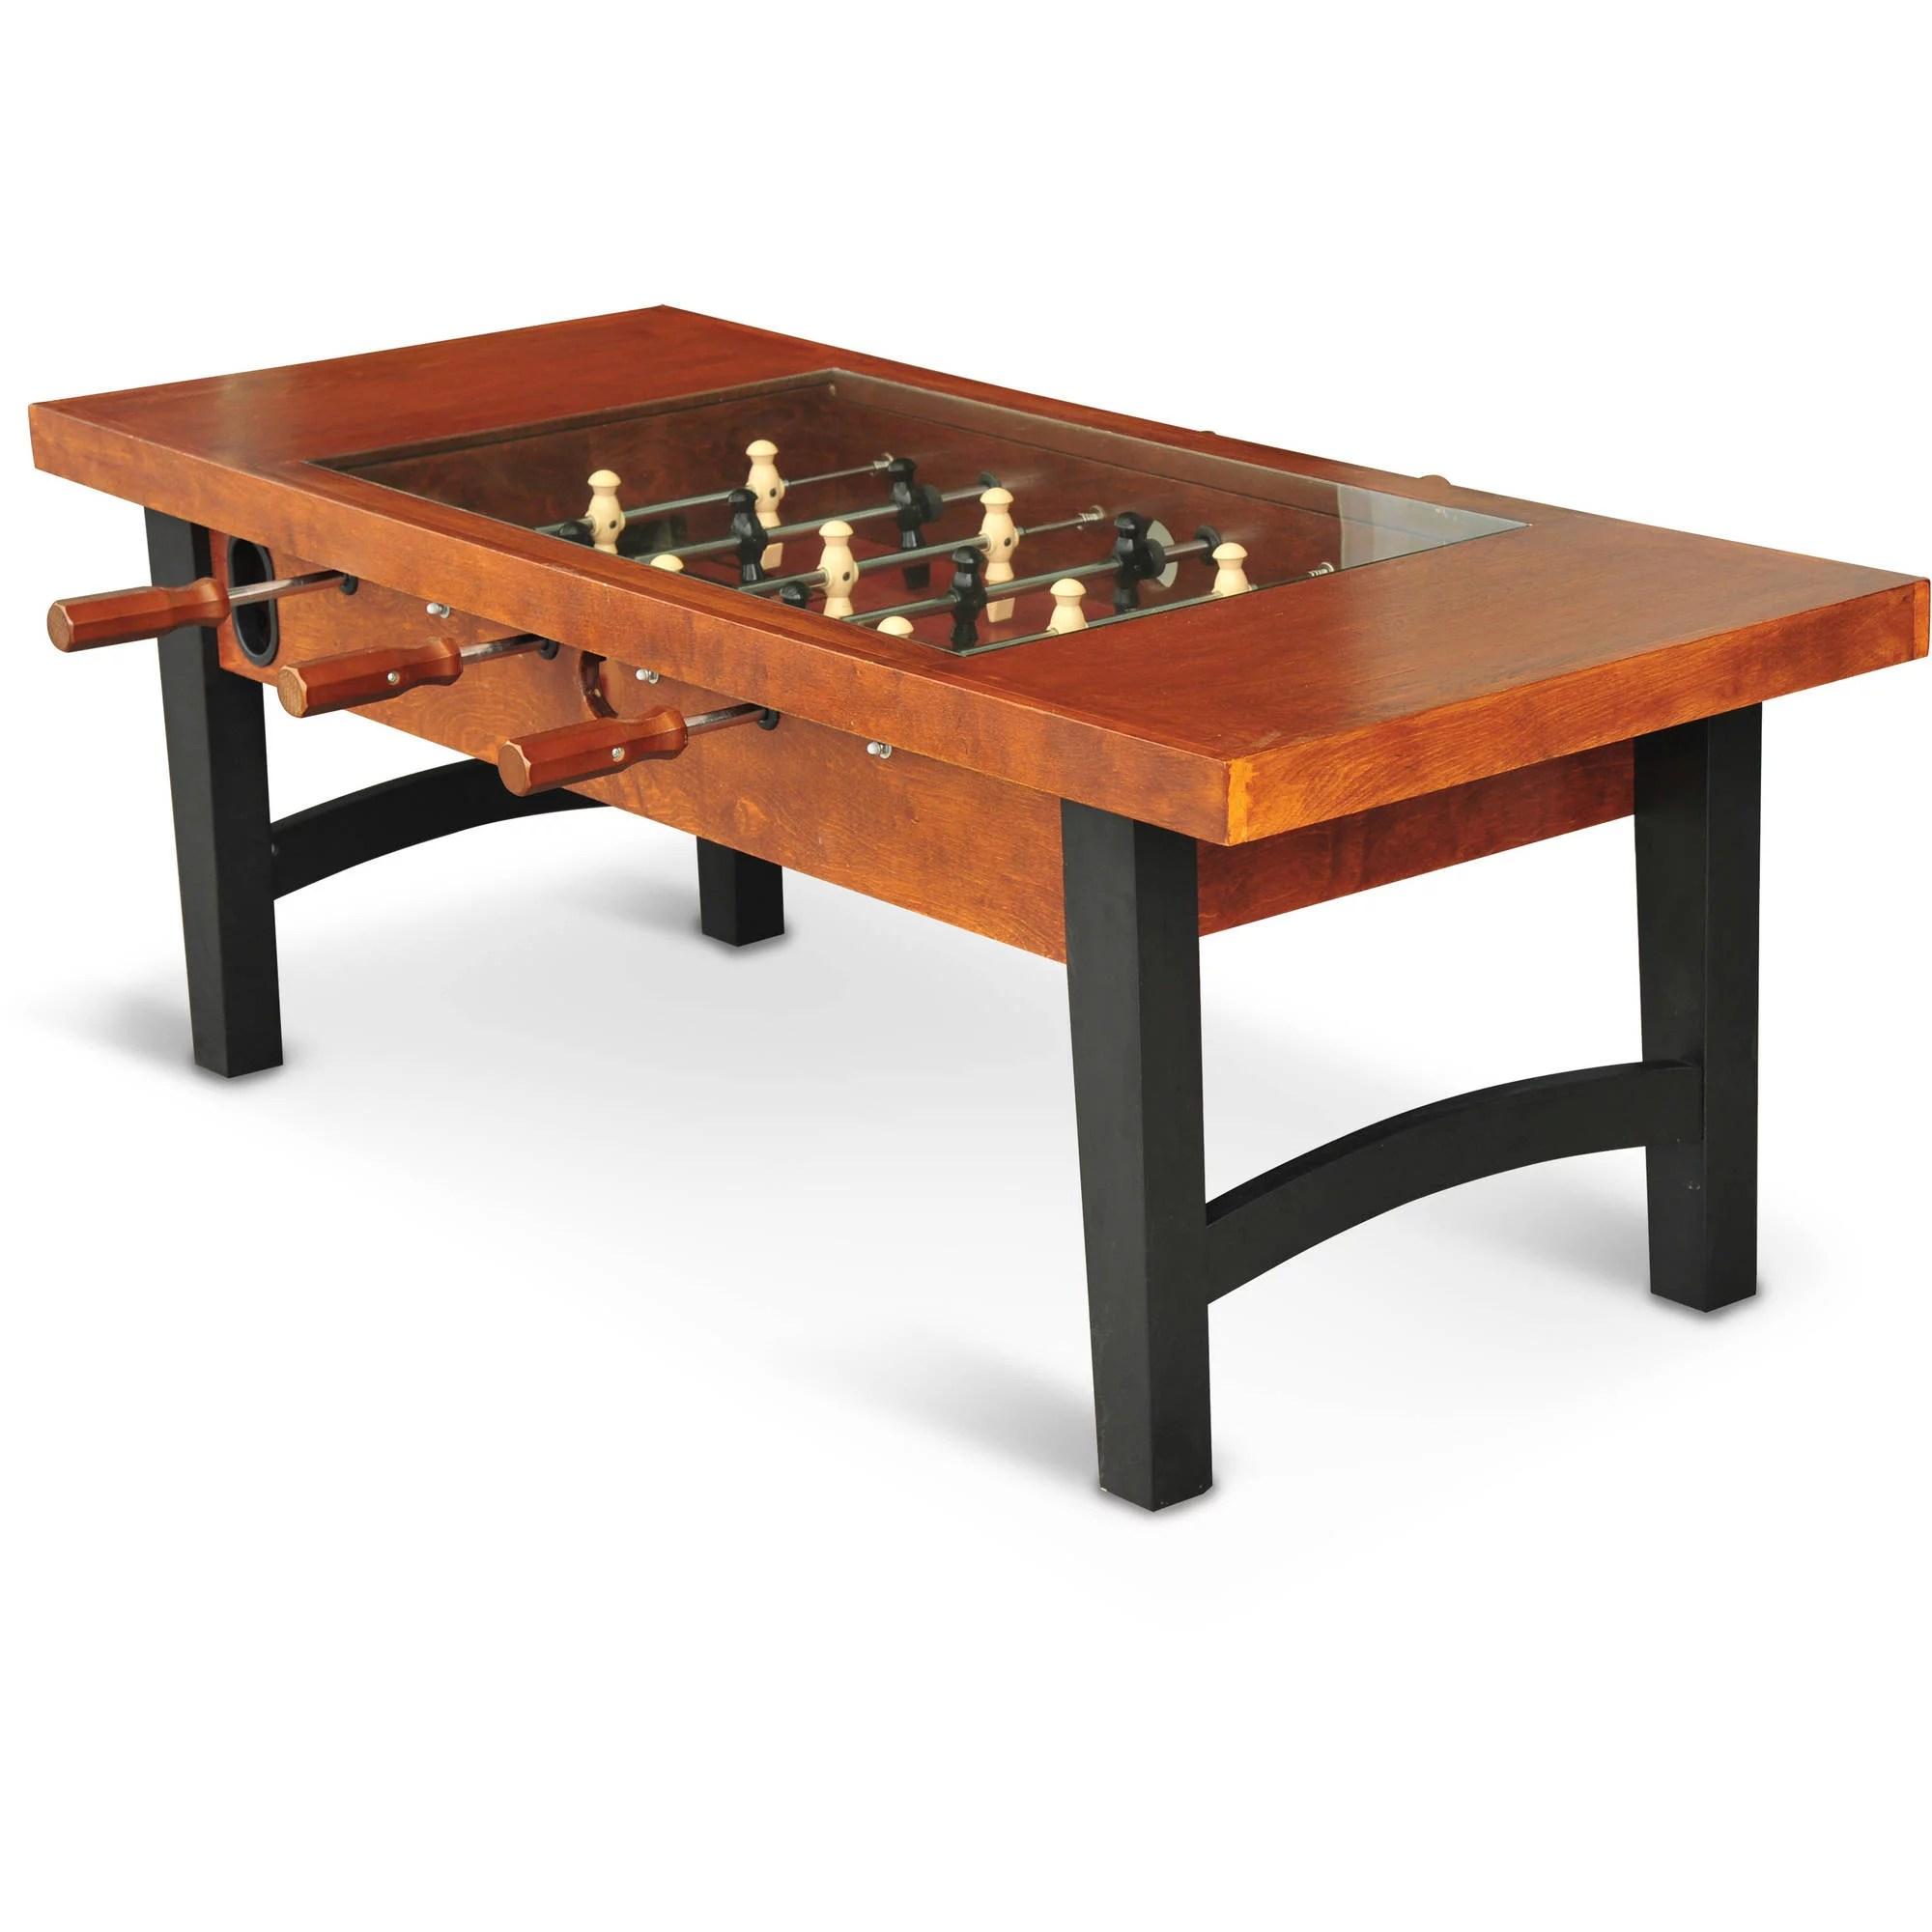 eastpoint sports 55 inch coffee table soccer foosball game table walmart com